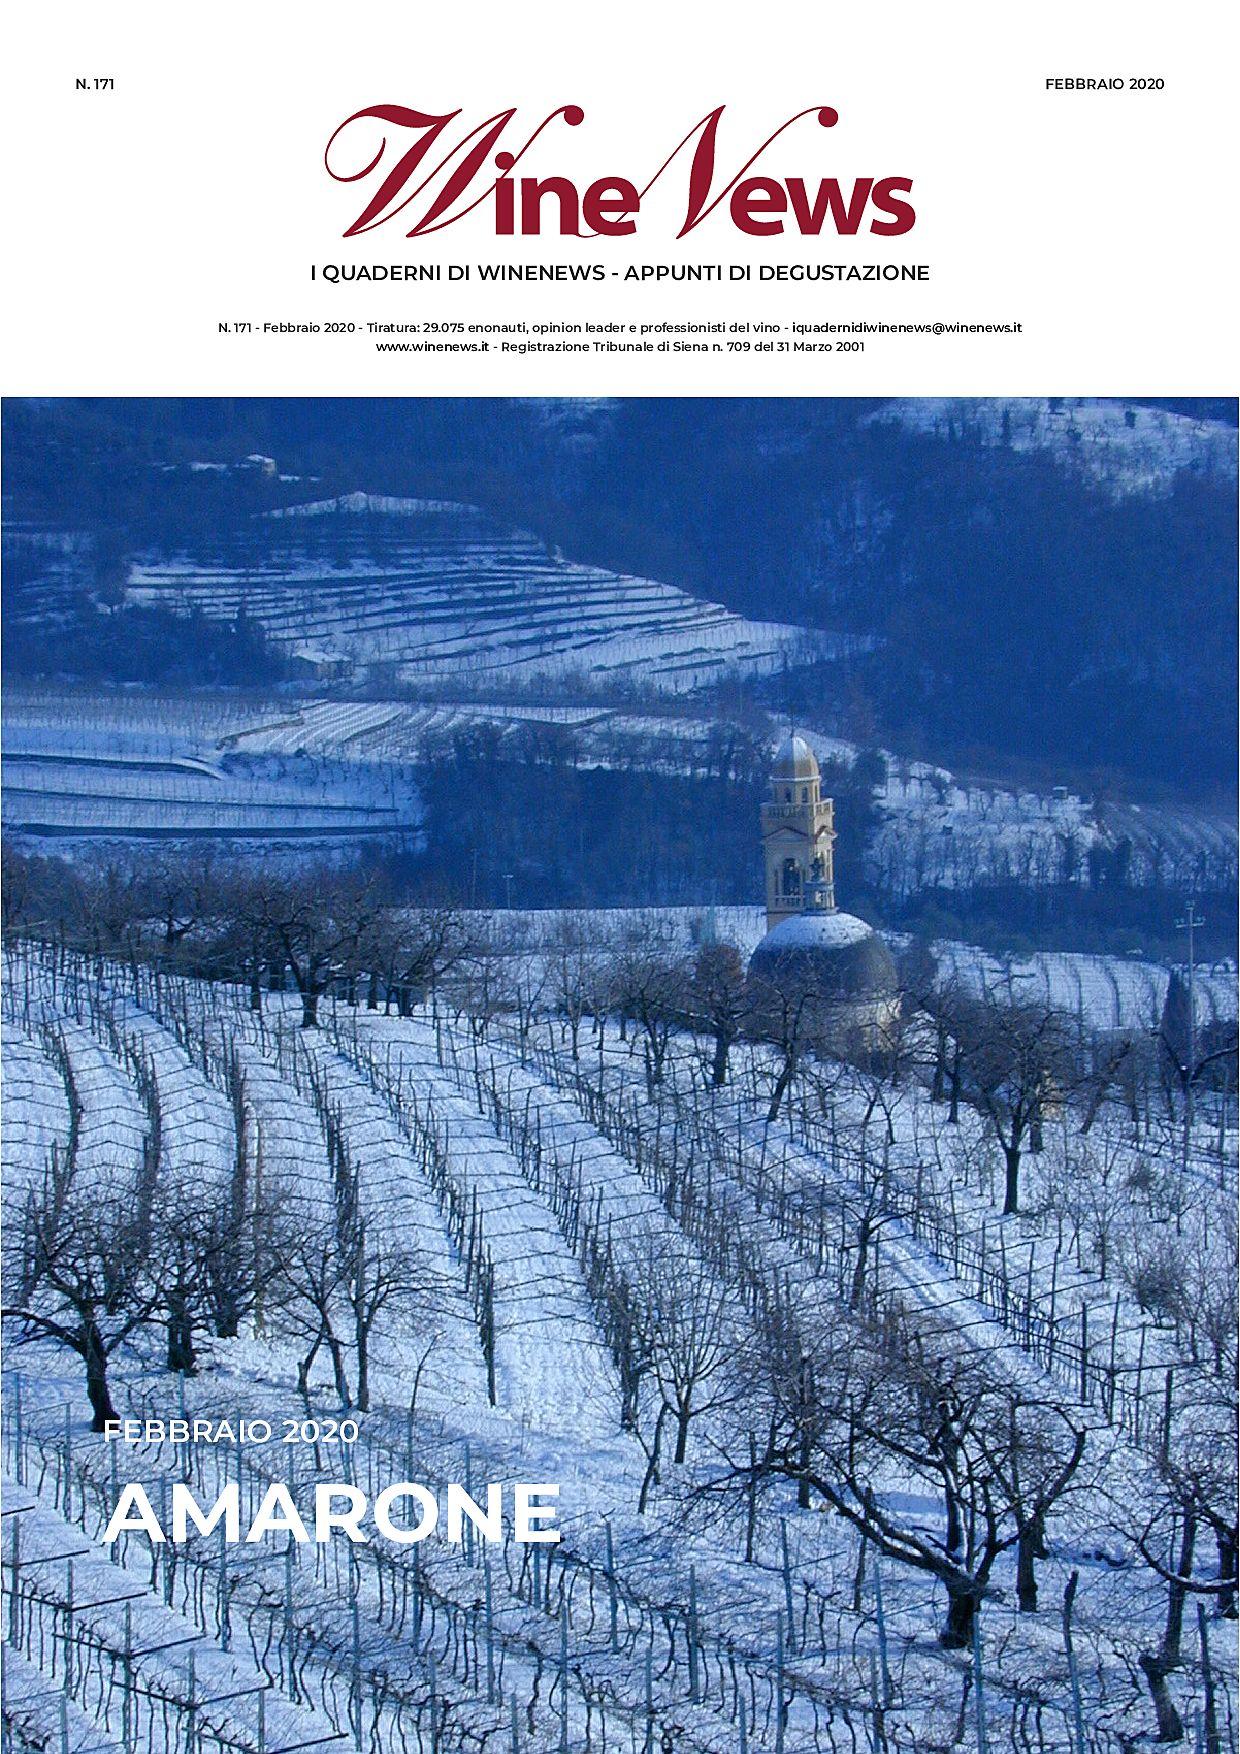 https://winenews.it/php/redirect_pdf.php?id=410267&t=1581702780